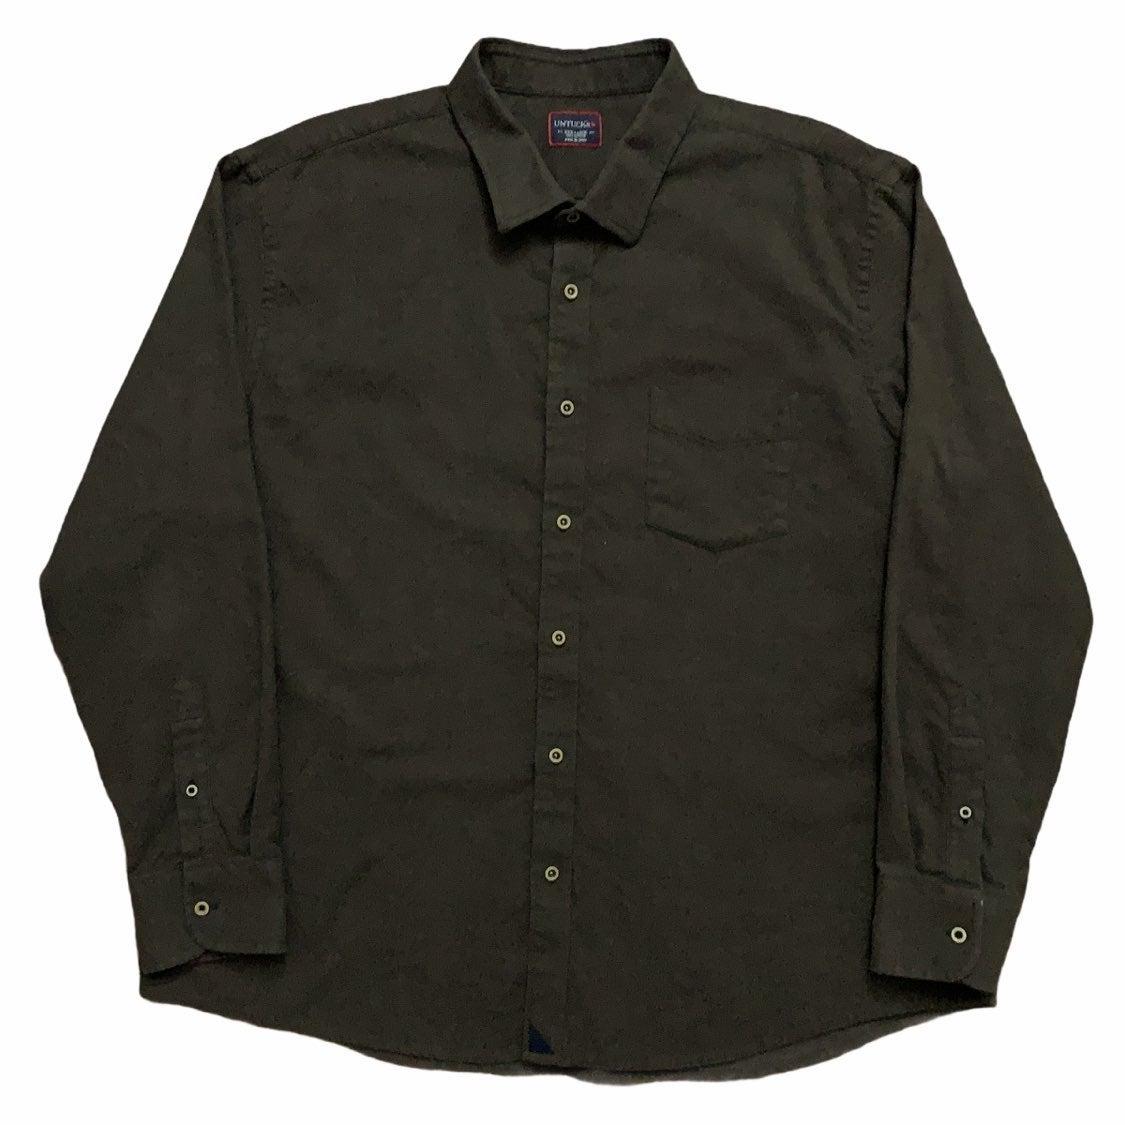 Untuckit Flannel Shirt Brown 3XL